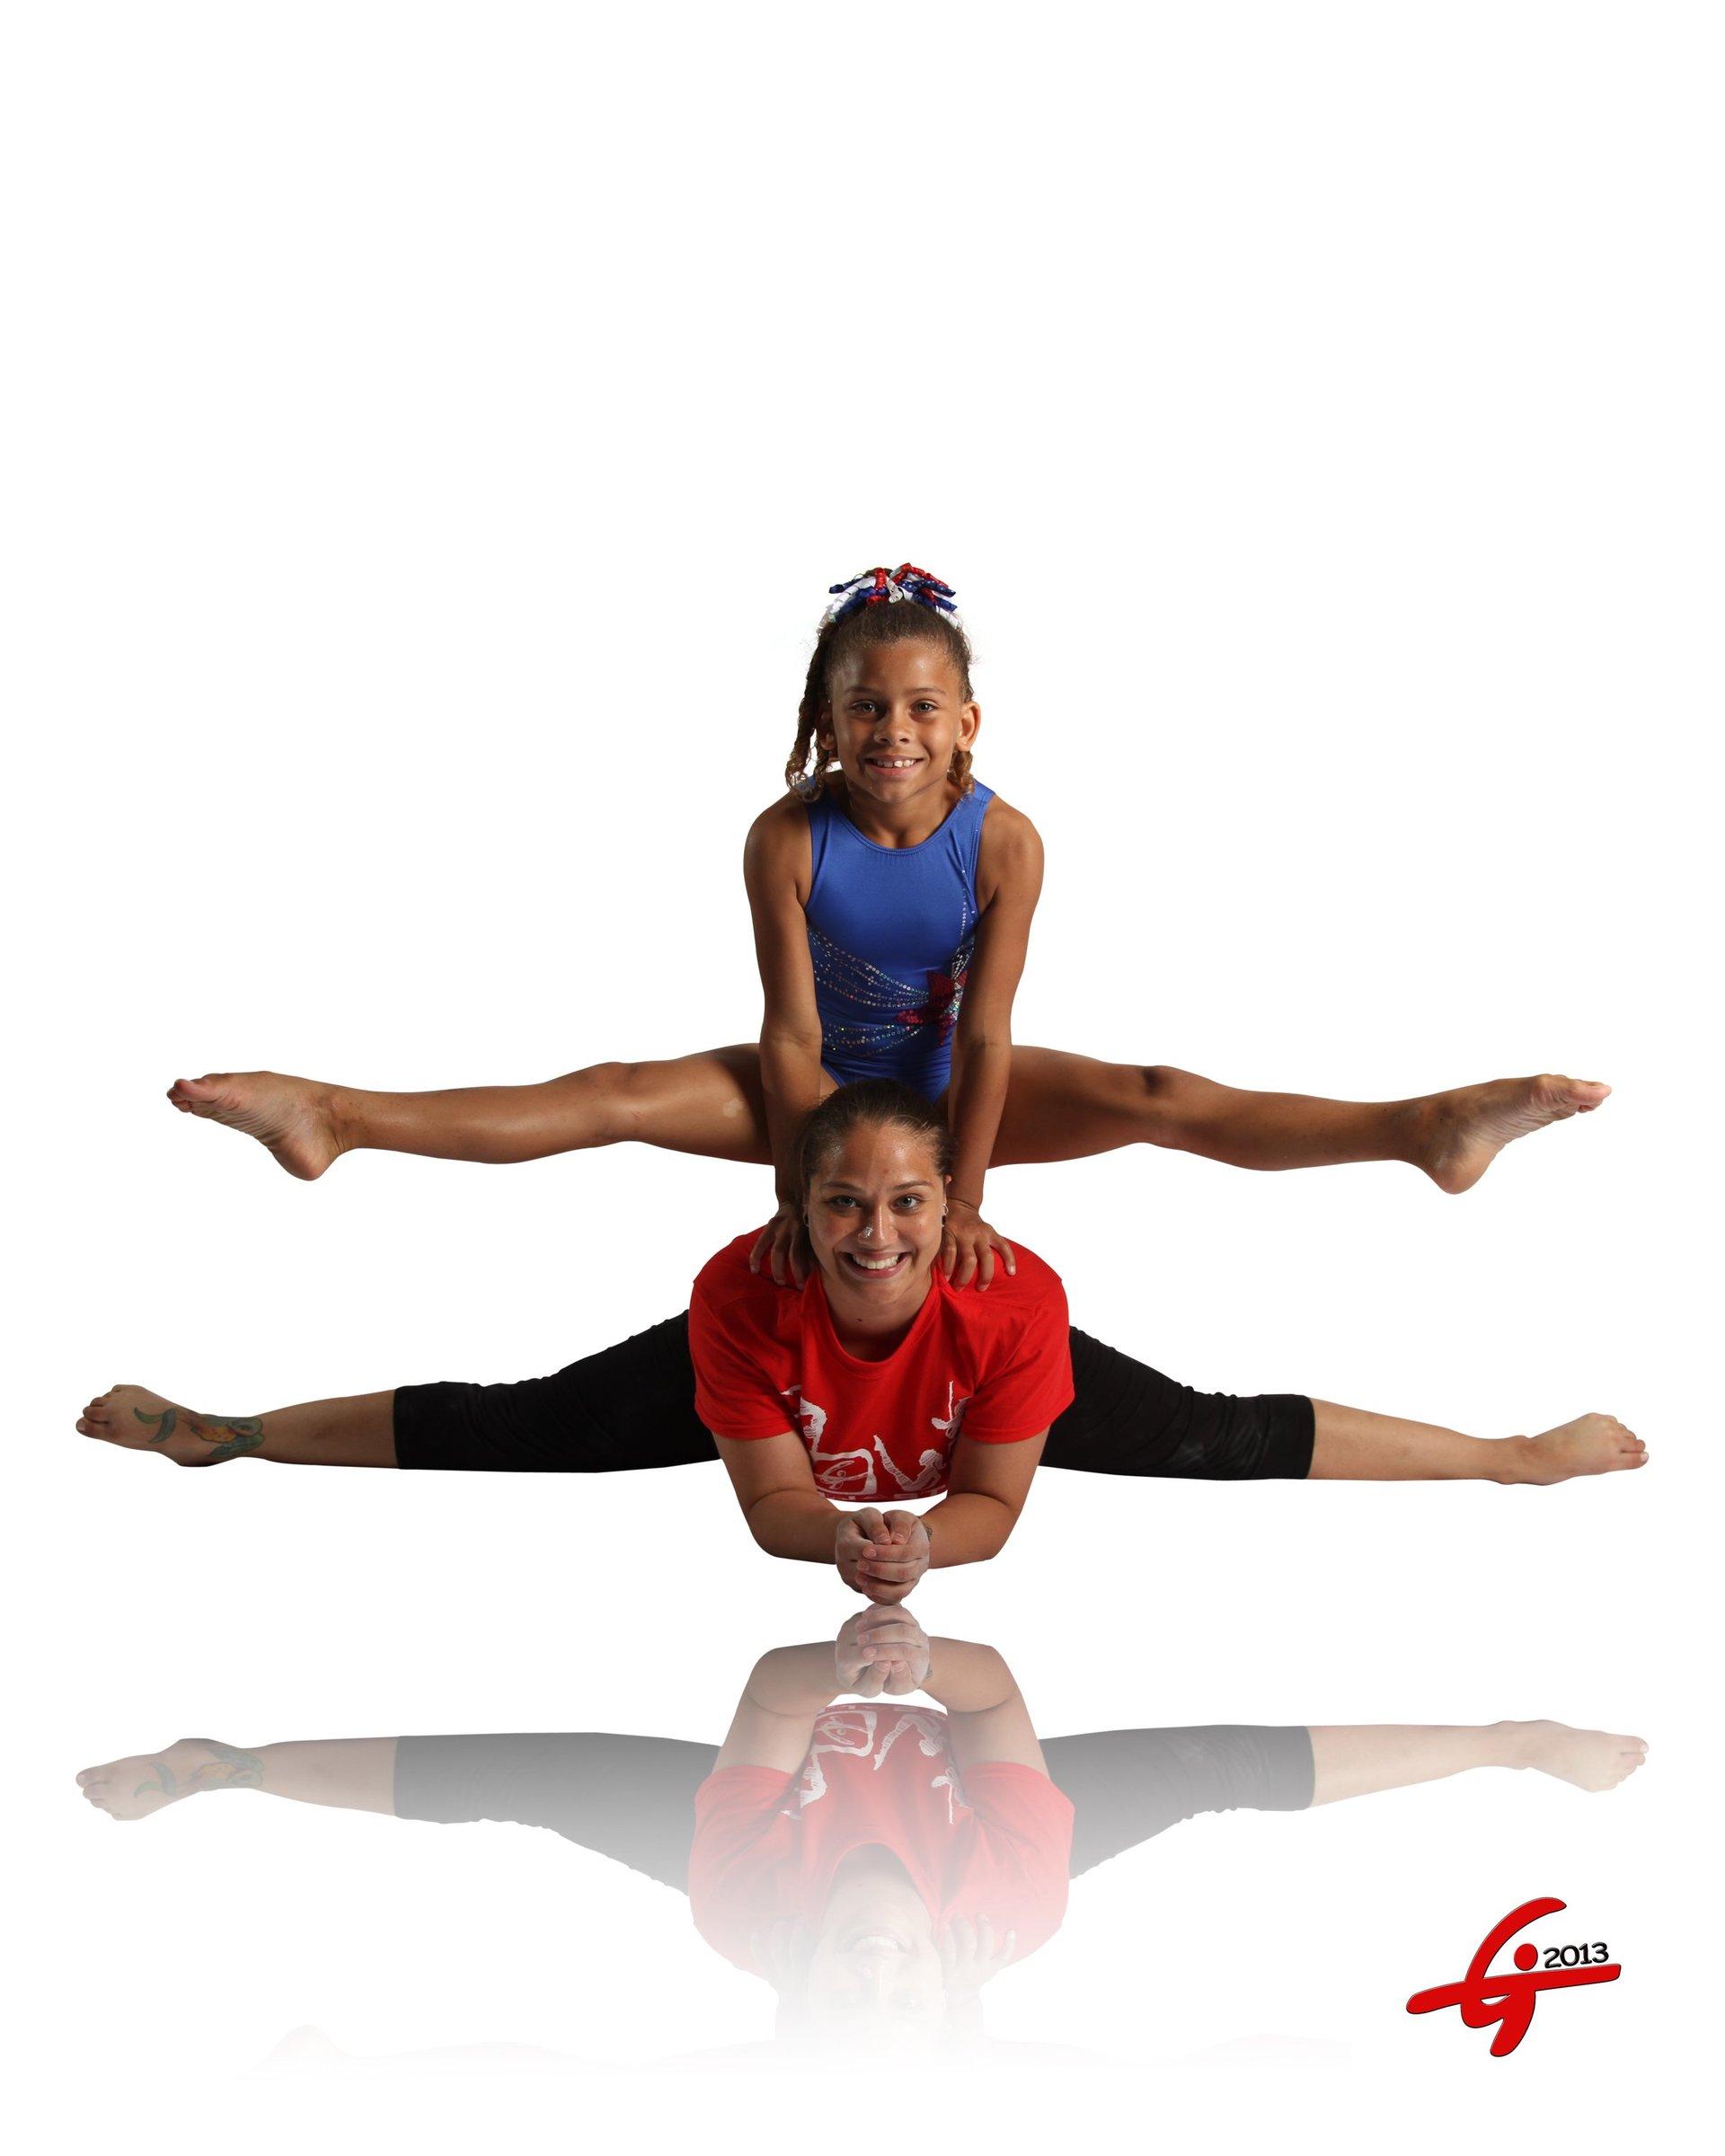 acro gymnastics team